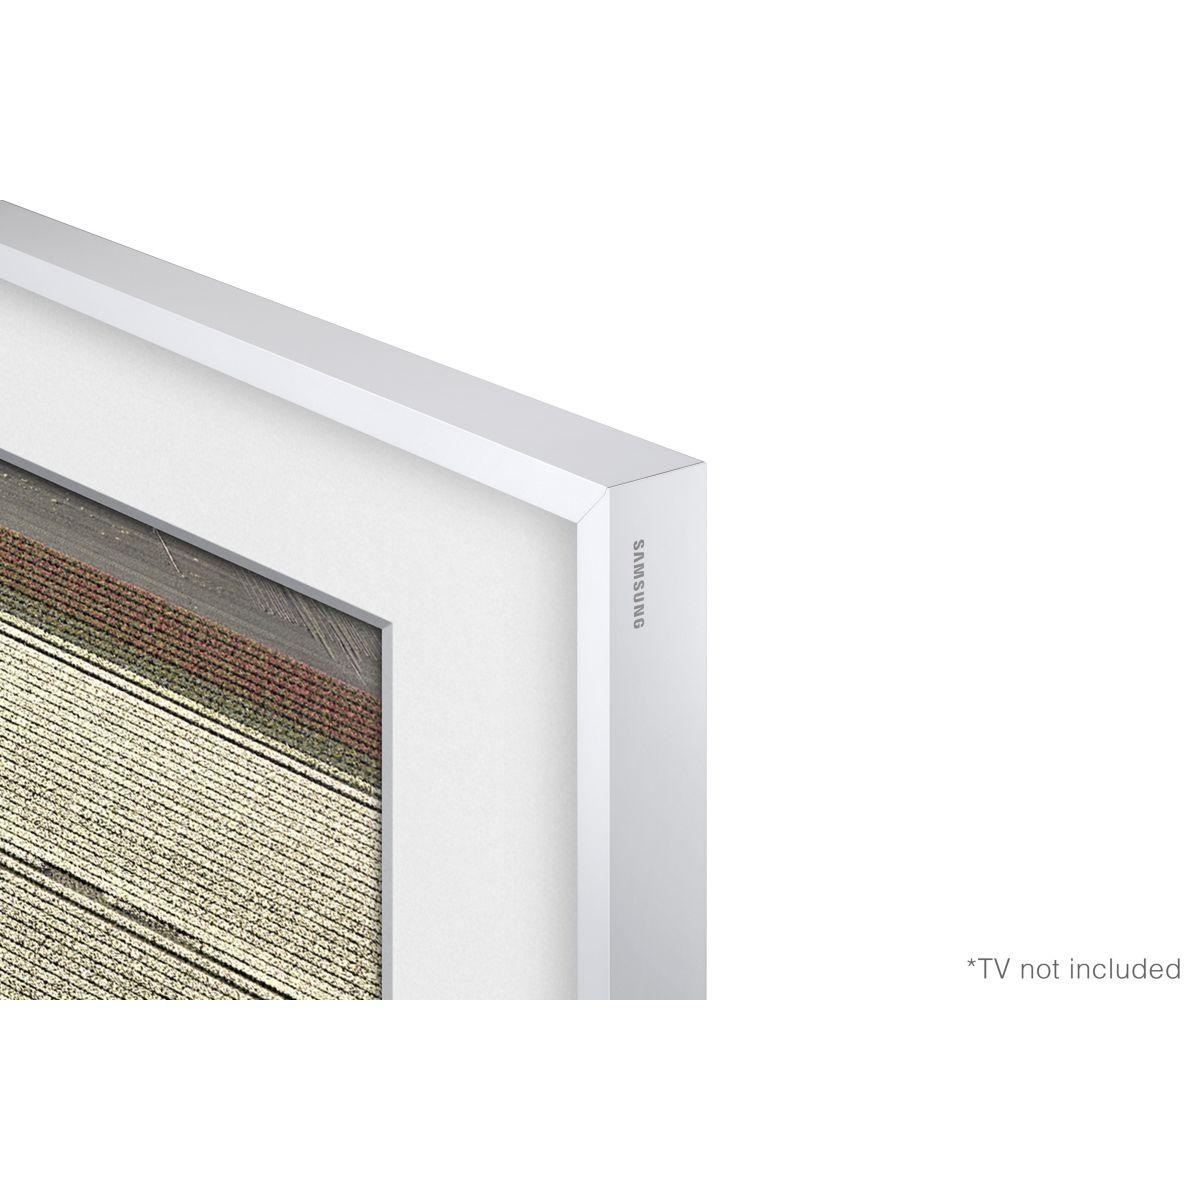 Cadre the frame samsung cadre vg-scfm55wm the frame white - 10% de remise imm�diate avec